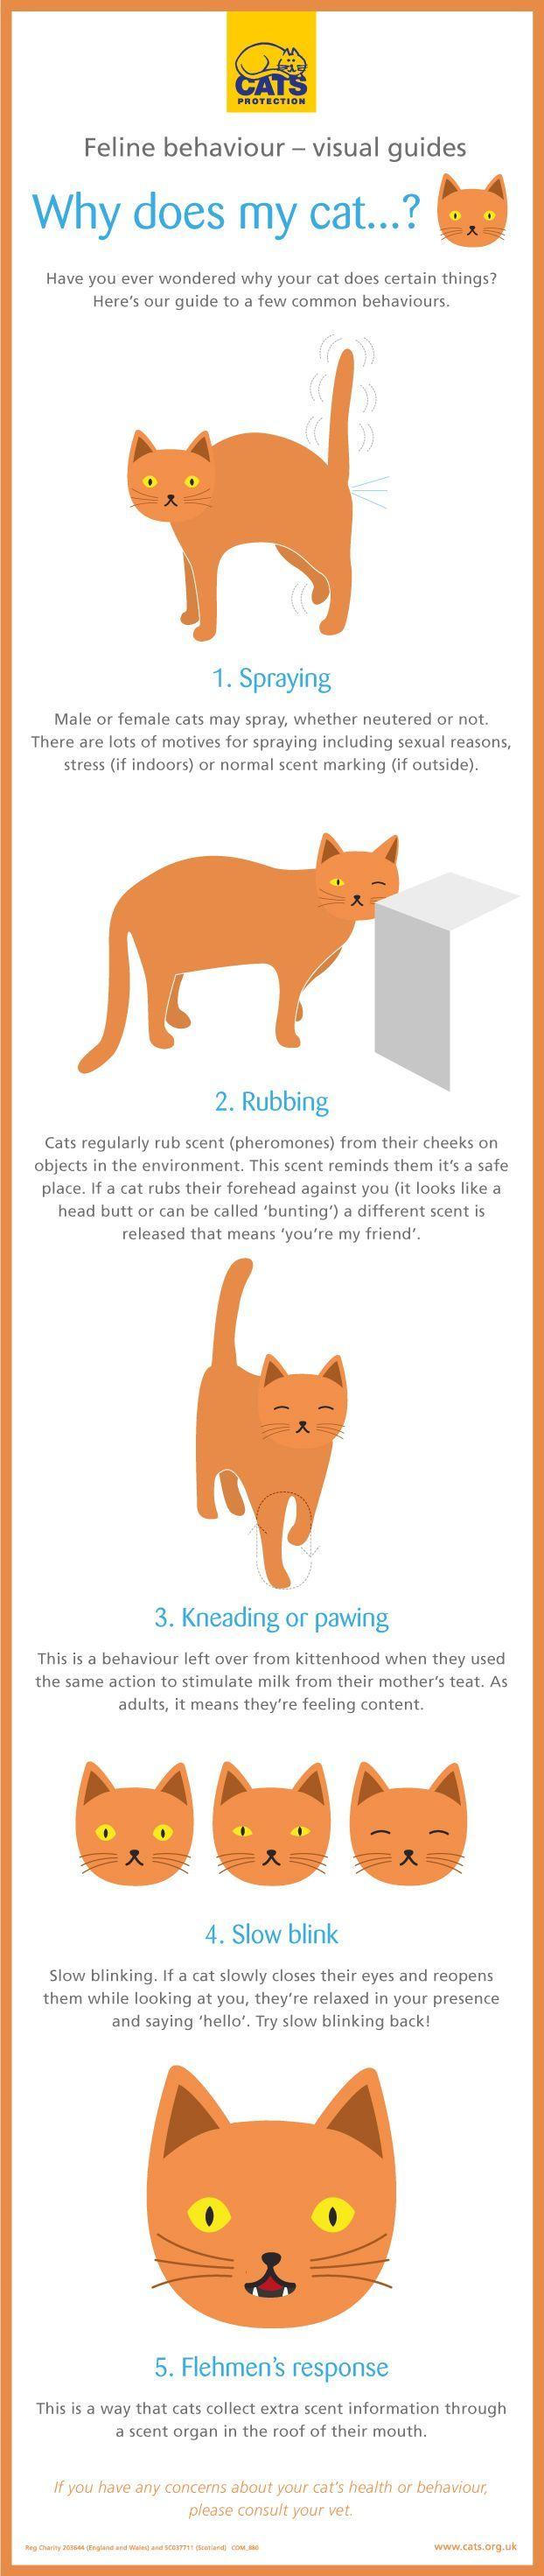 Feline Behaviour Explained Why Does My Cat Cat Behavior Cat Language Cat Care